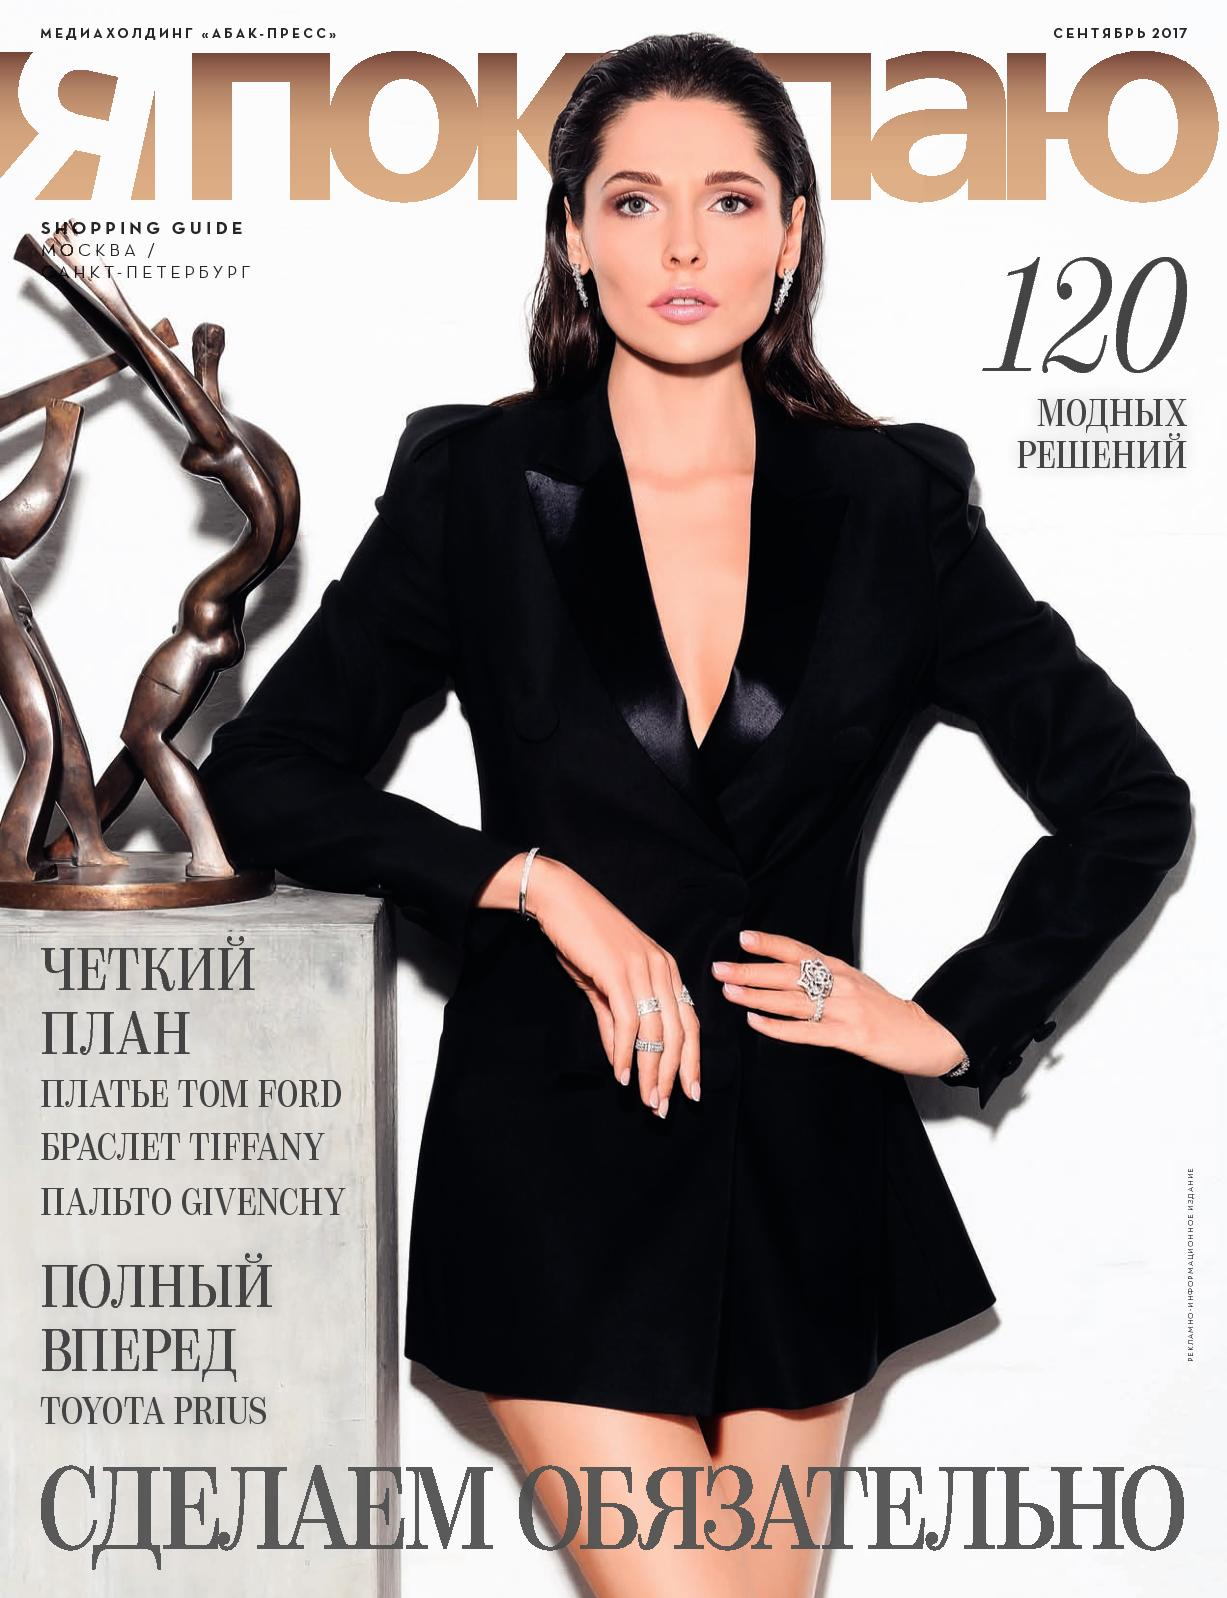 Calaméo - Shopping Guide «Я Покупаю. Москва - Санкт-Петербург», сентябрь  2017 3a4ff0f686a